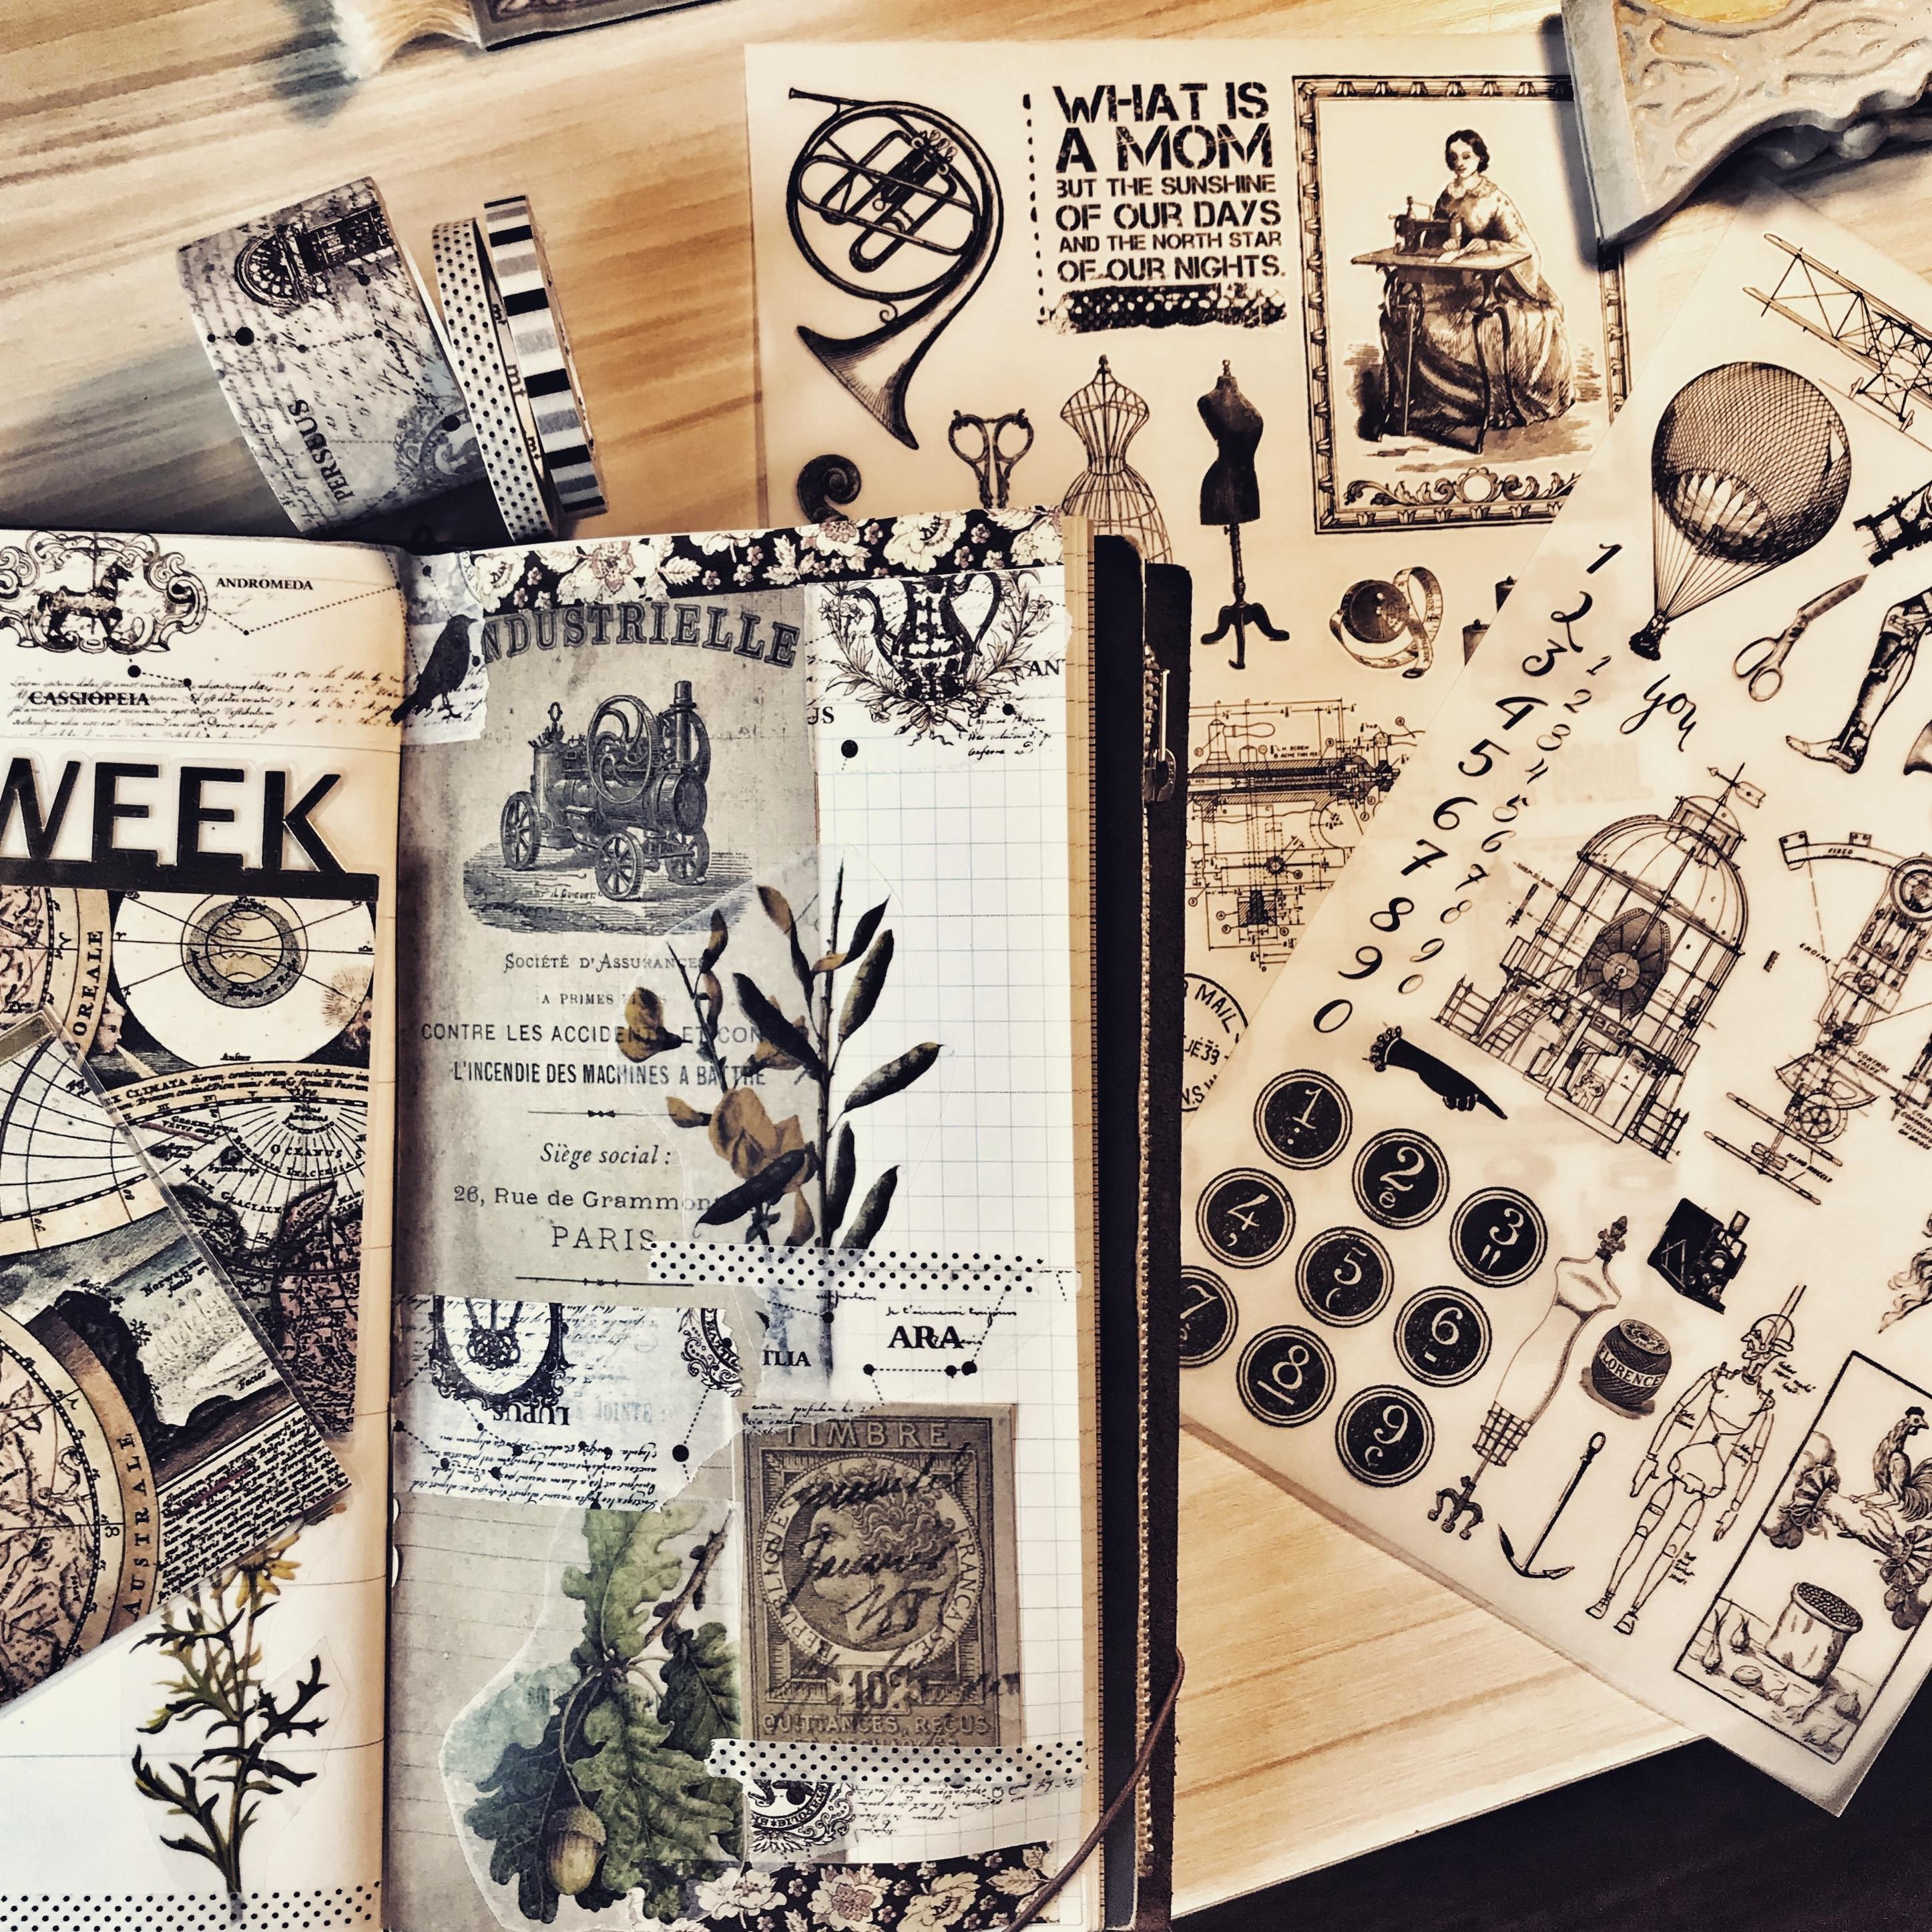 2Pcs Vintage RUB ON Stickers Children DIY Scrapbooking Album Journal Crafts Decorative Transfer Paper Package DIY Photo Albums